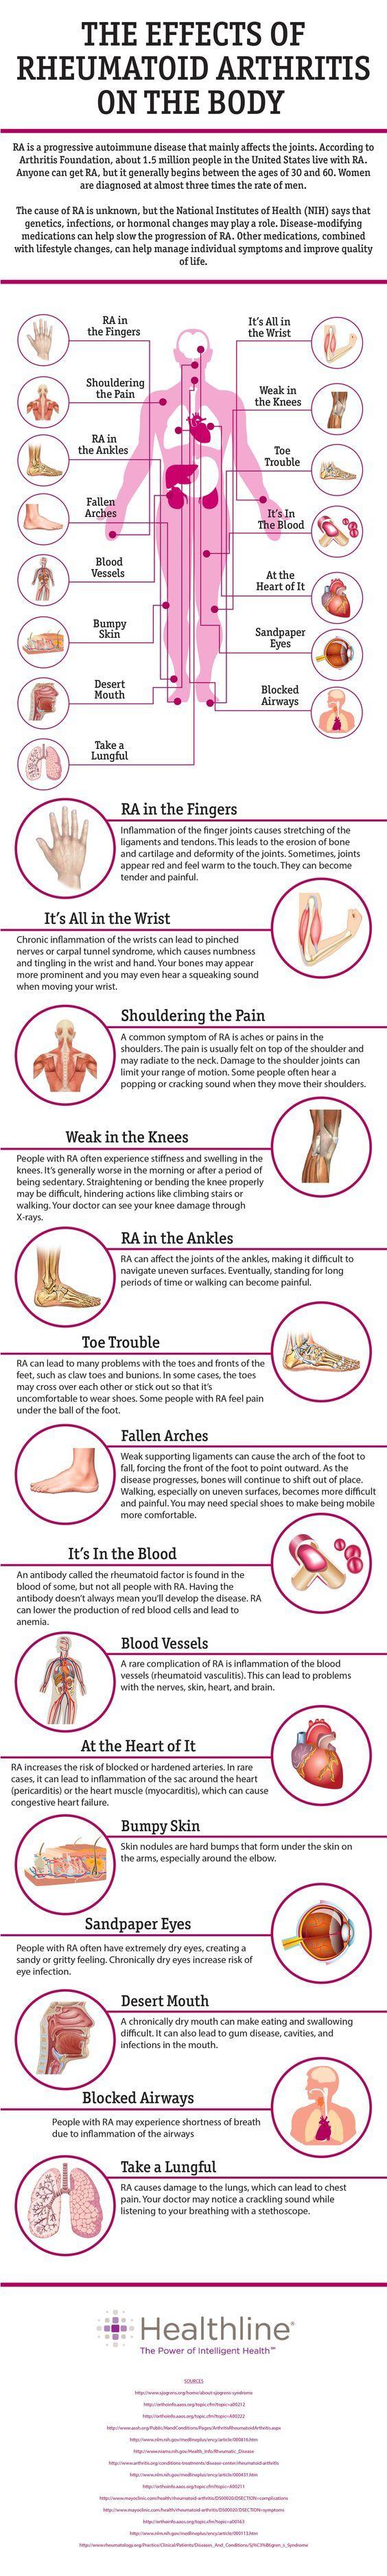 The Effects of Rheumatoid Arthritis On the Body